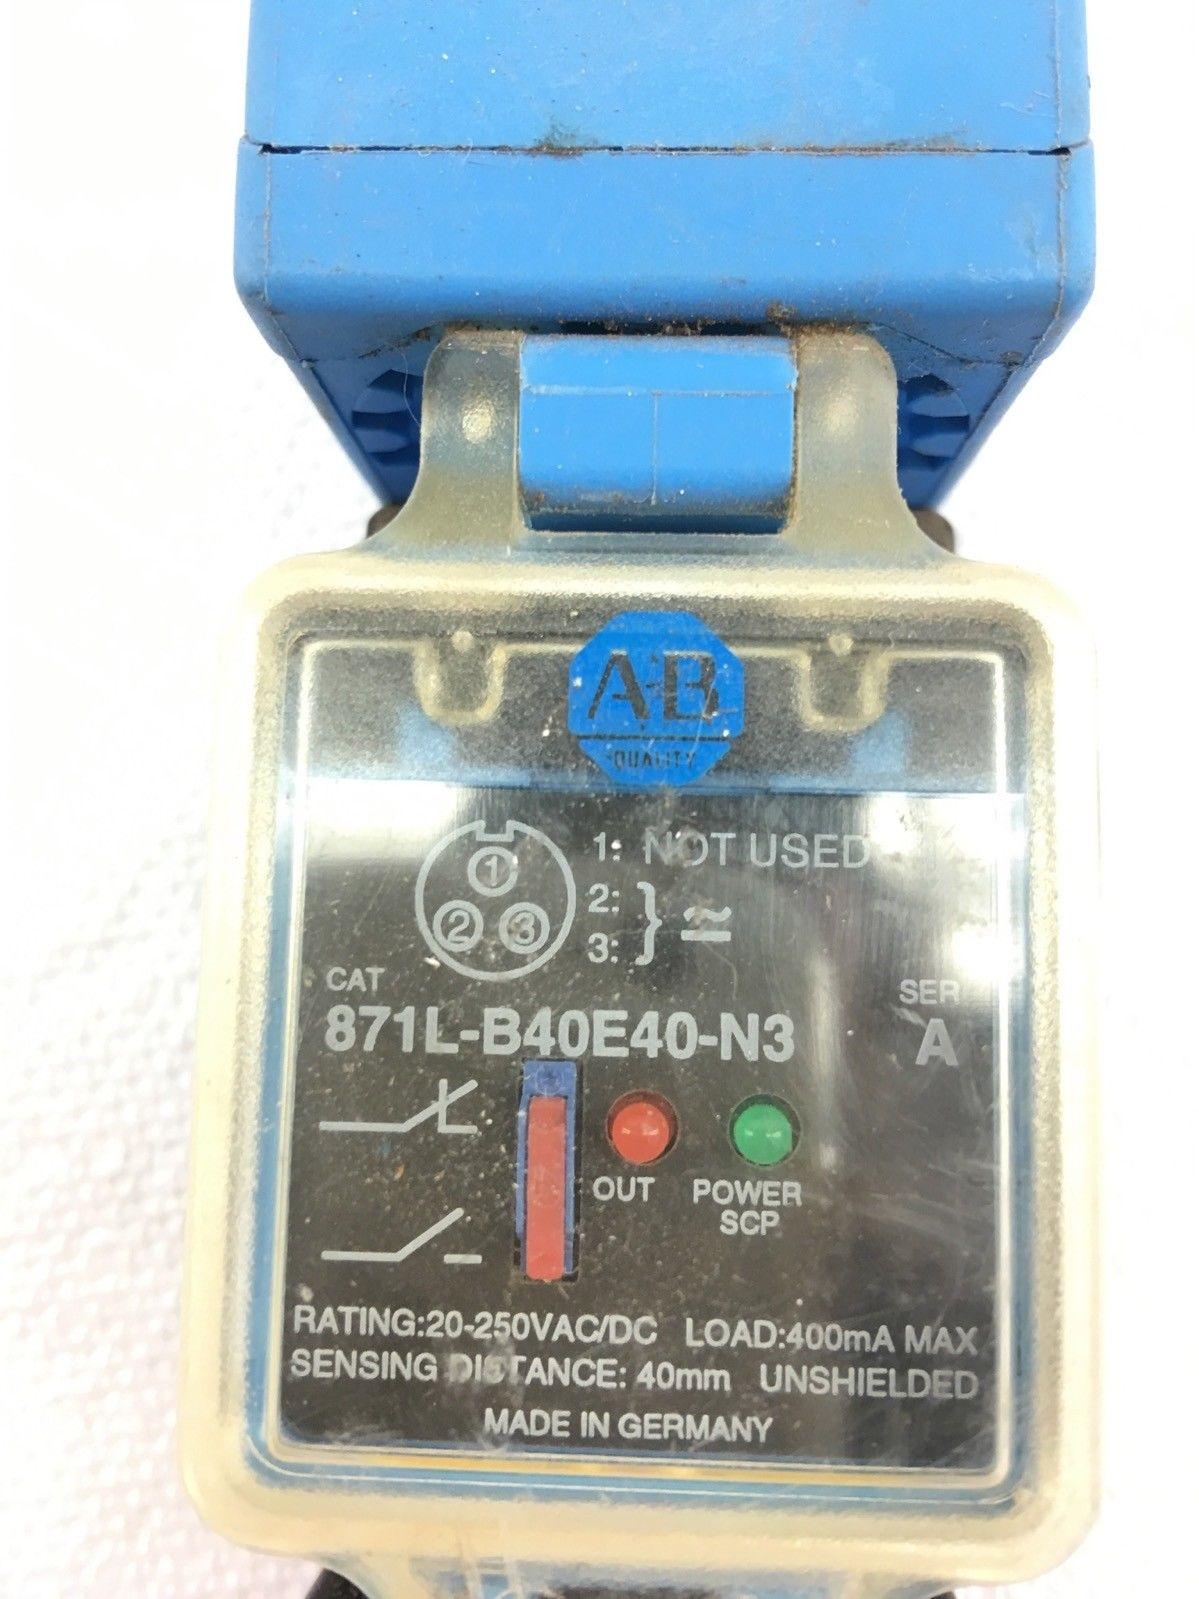 USED ALLEN BRADLEY 871L-B40E40-N3 SERIES A INDUCTIVE PROXIMITY SENSOR, (A594) 2